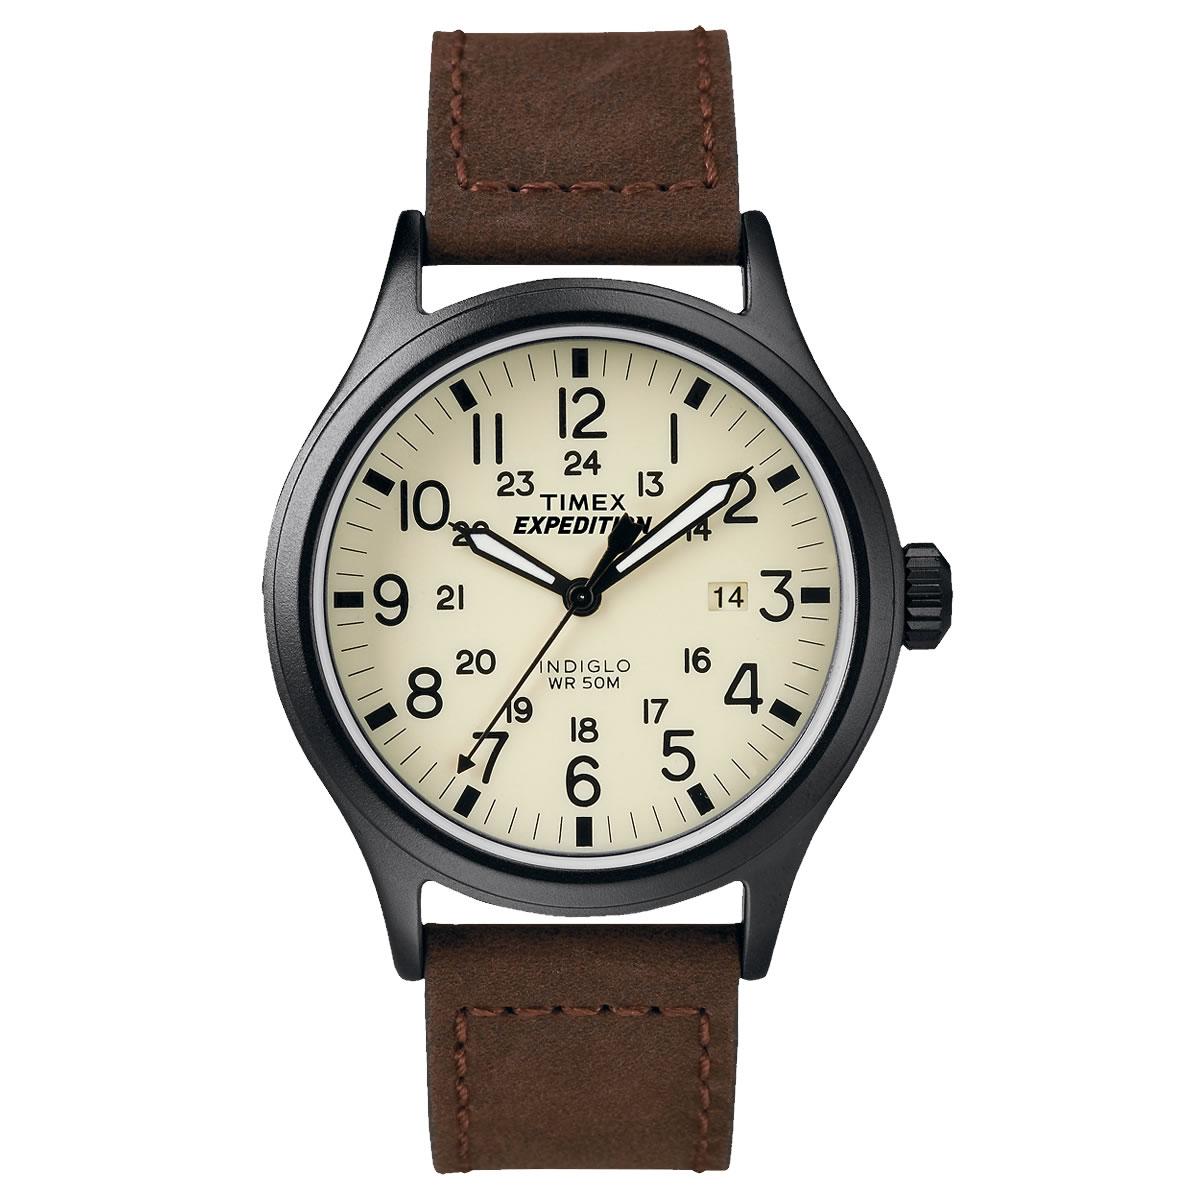 TIMEX(タイメックス)腕時計/エクスペディション・スカウトメタル/ブラウン T49963